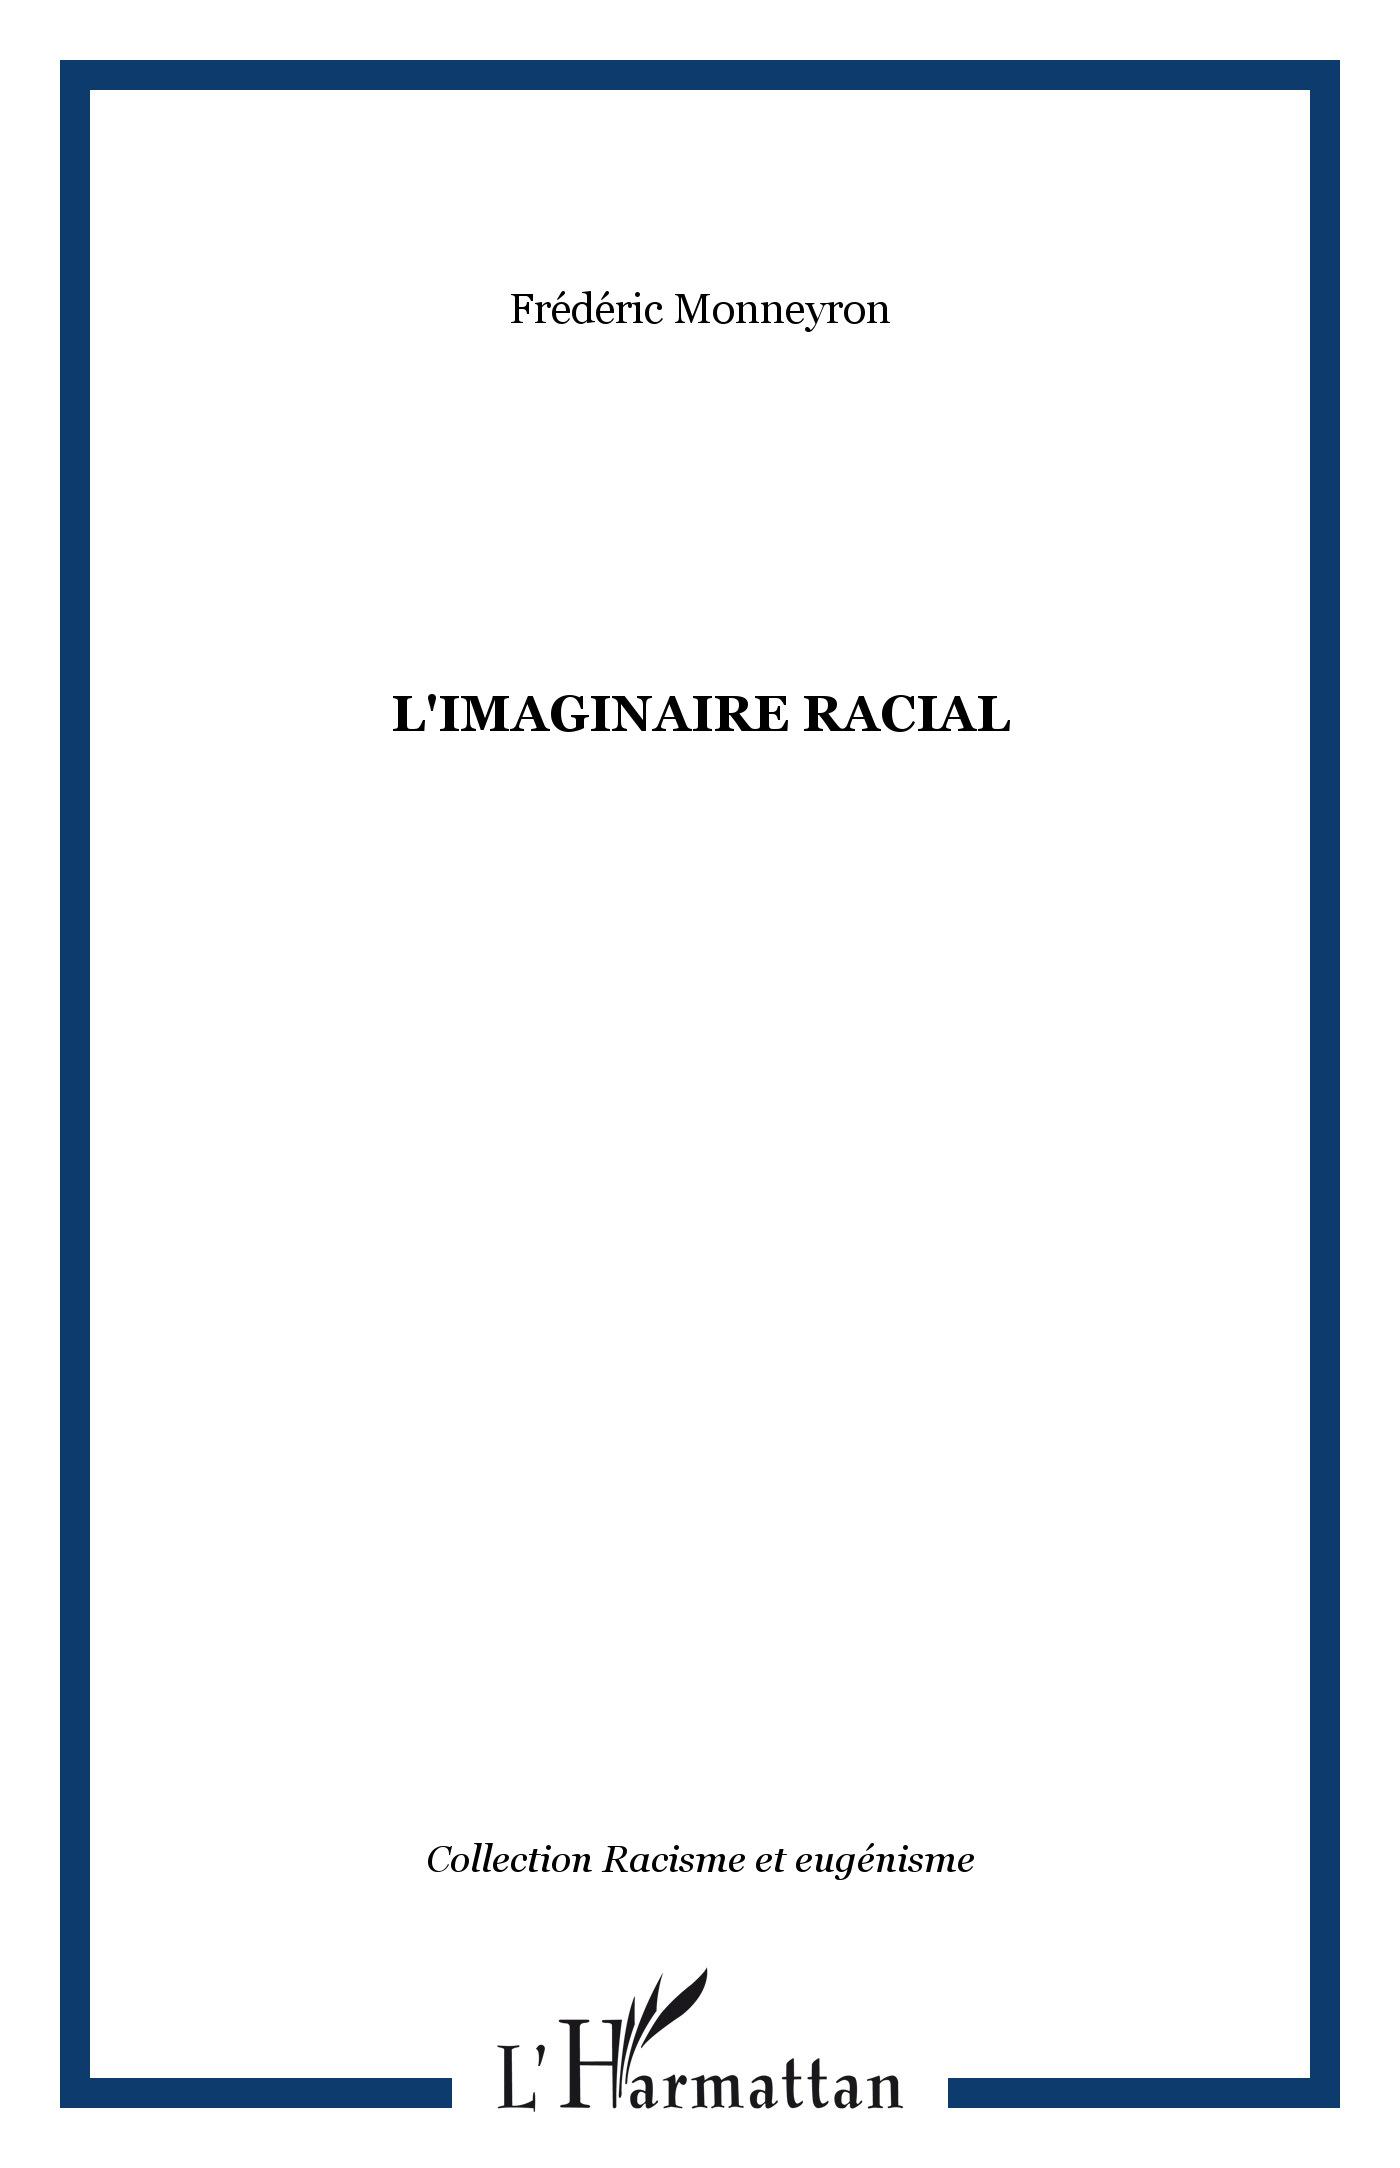 L'imaginaire racial